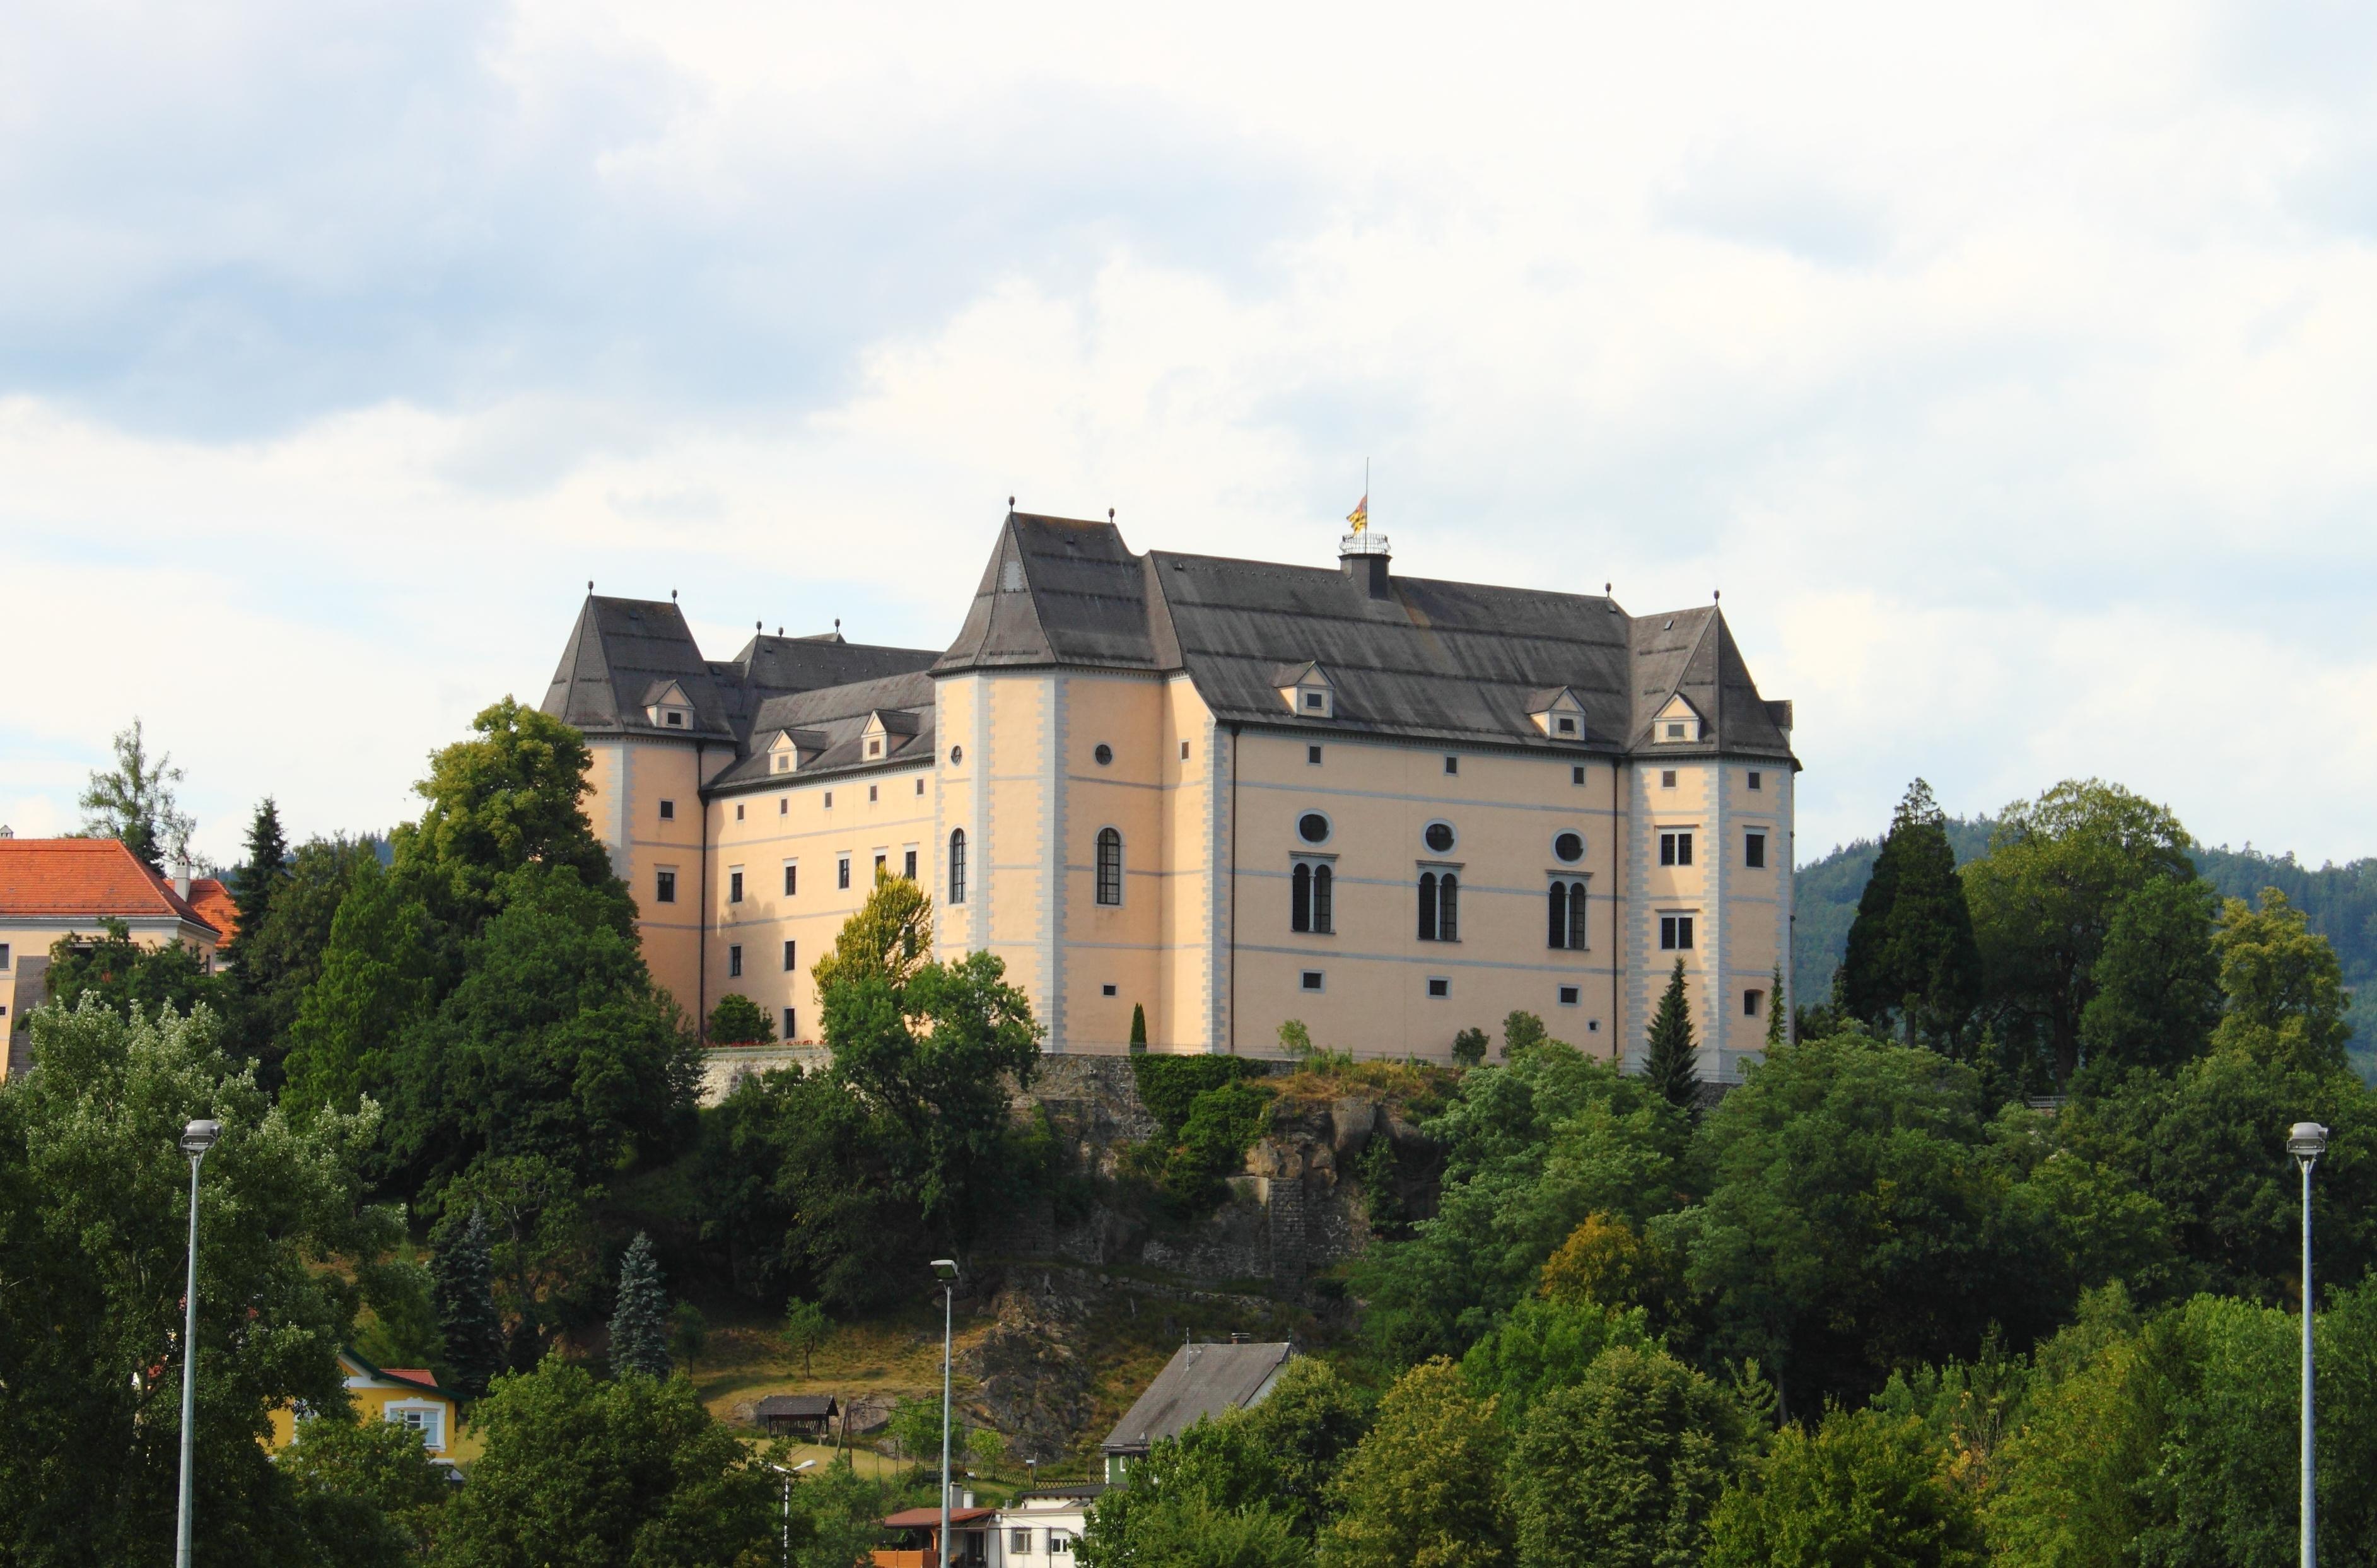 8-daagse fietsvakantie Passau - Wenen